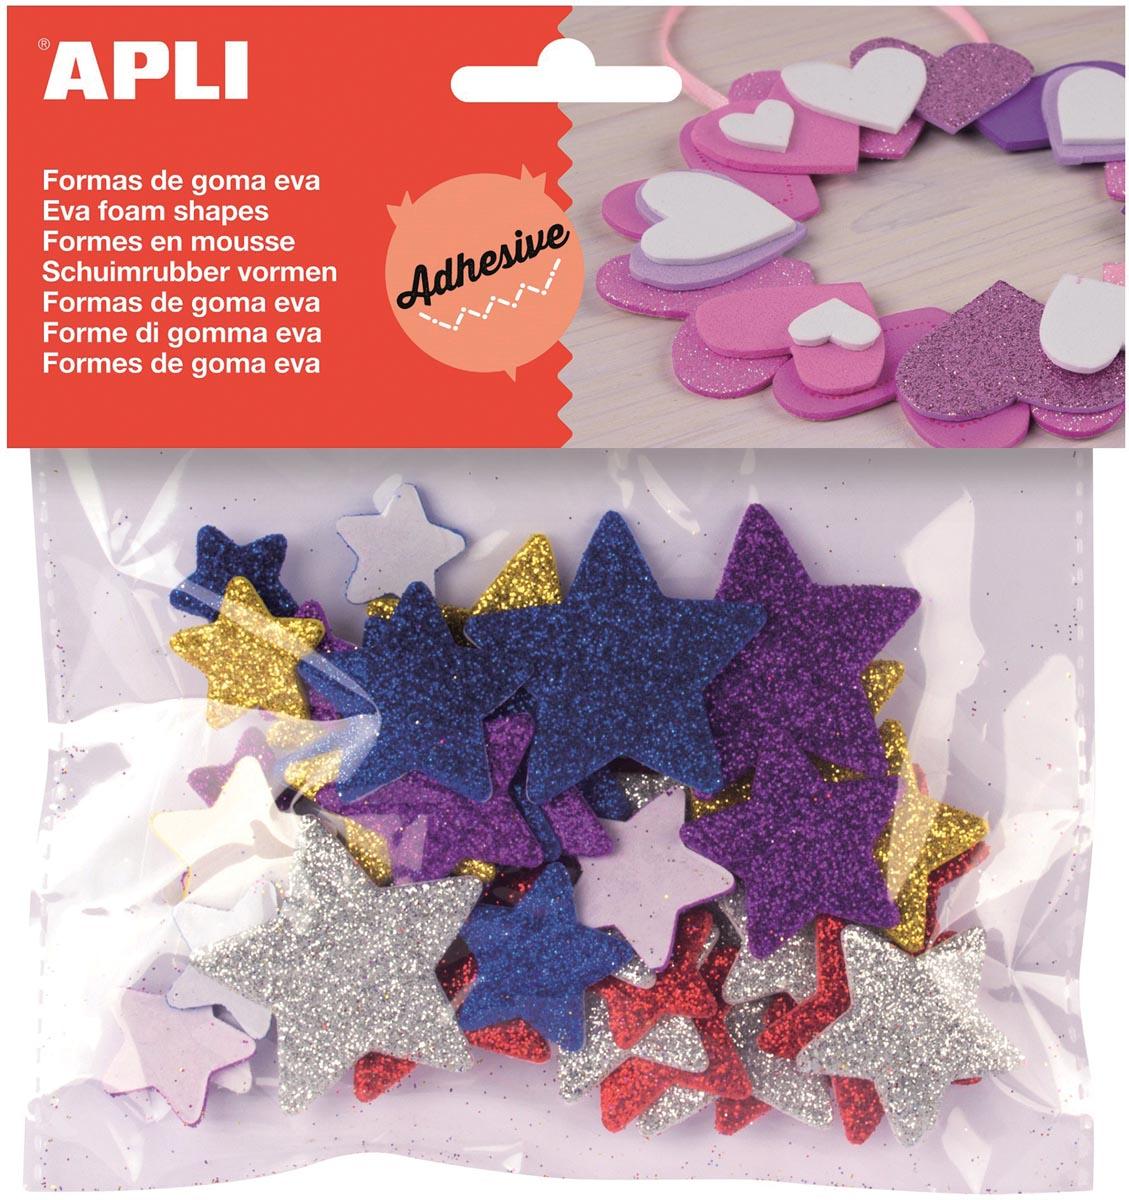 APLI Apli Kids schuimrubber vormen sterren, 50 stuks (13485)